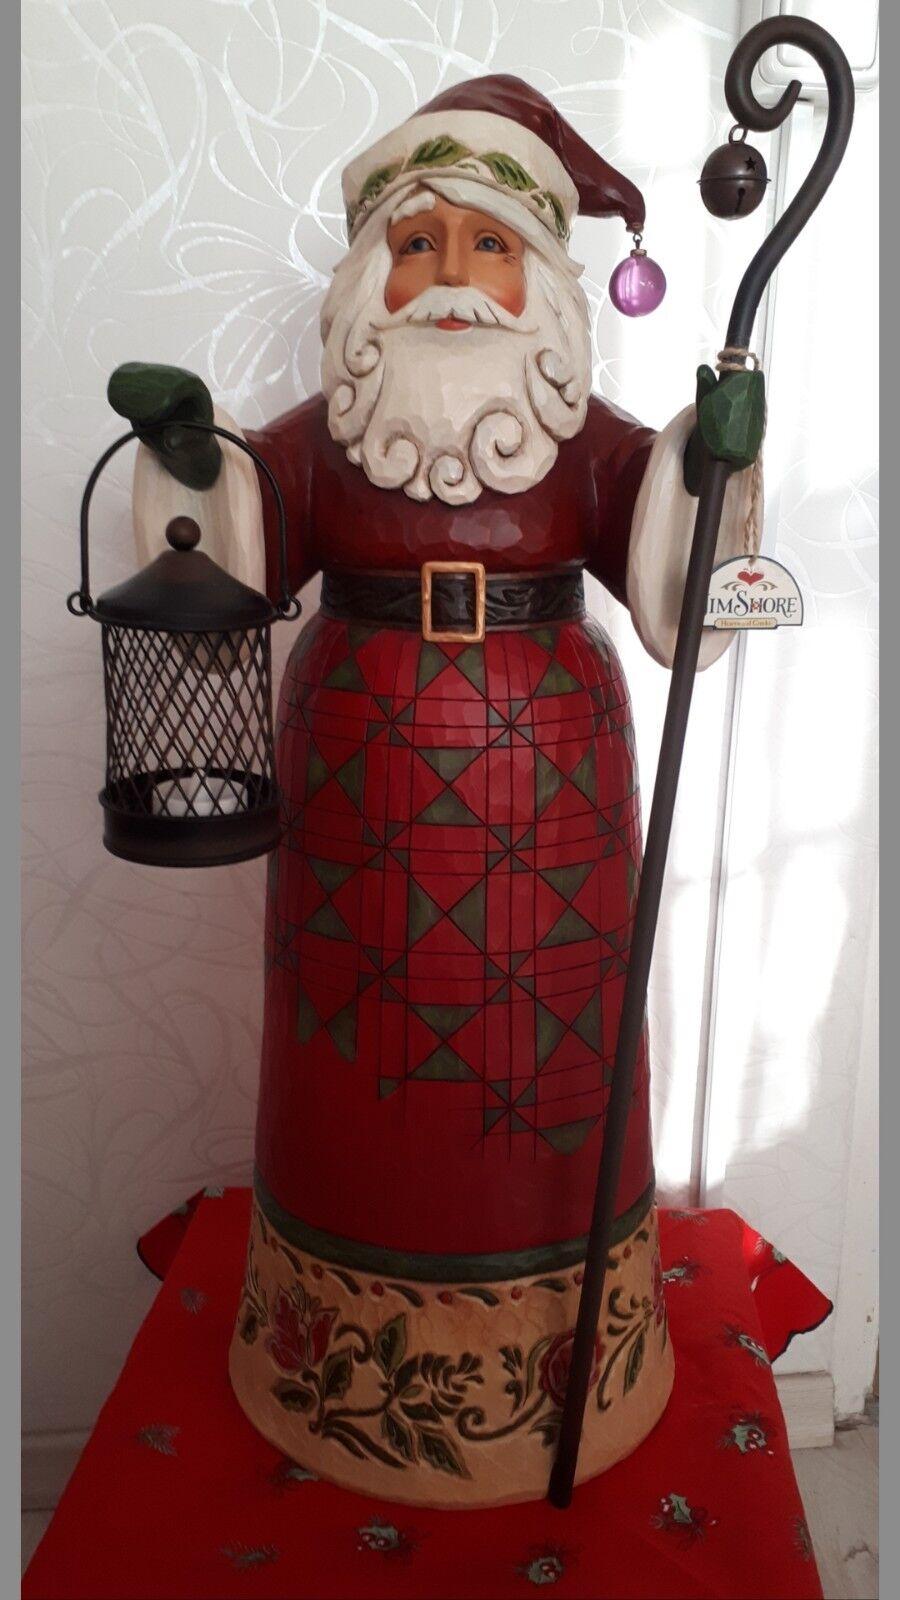 Jim Shore Christmas Santa- Weihnachtsmann Weihnachtsmann Weihnachtsmann 68 cm groß 170e61